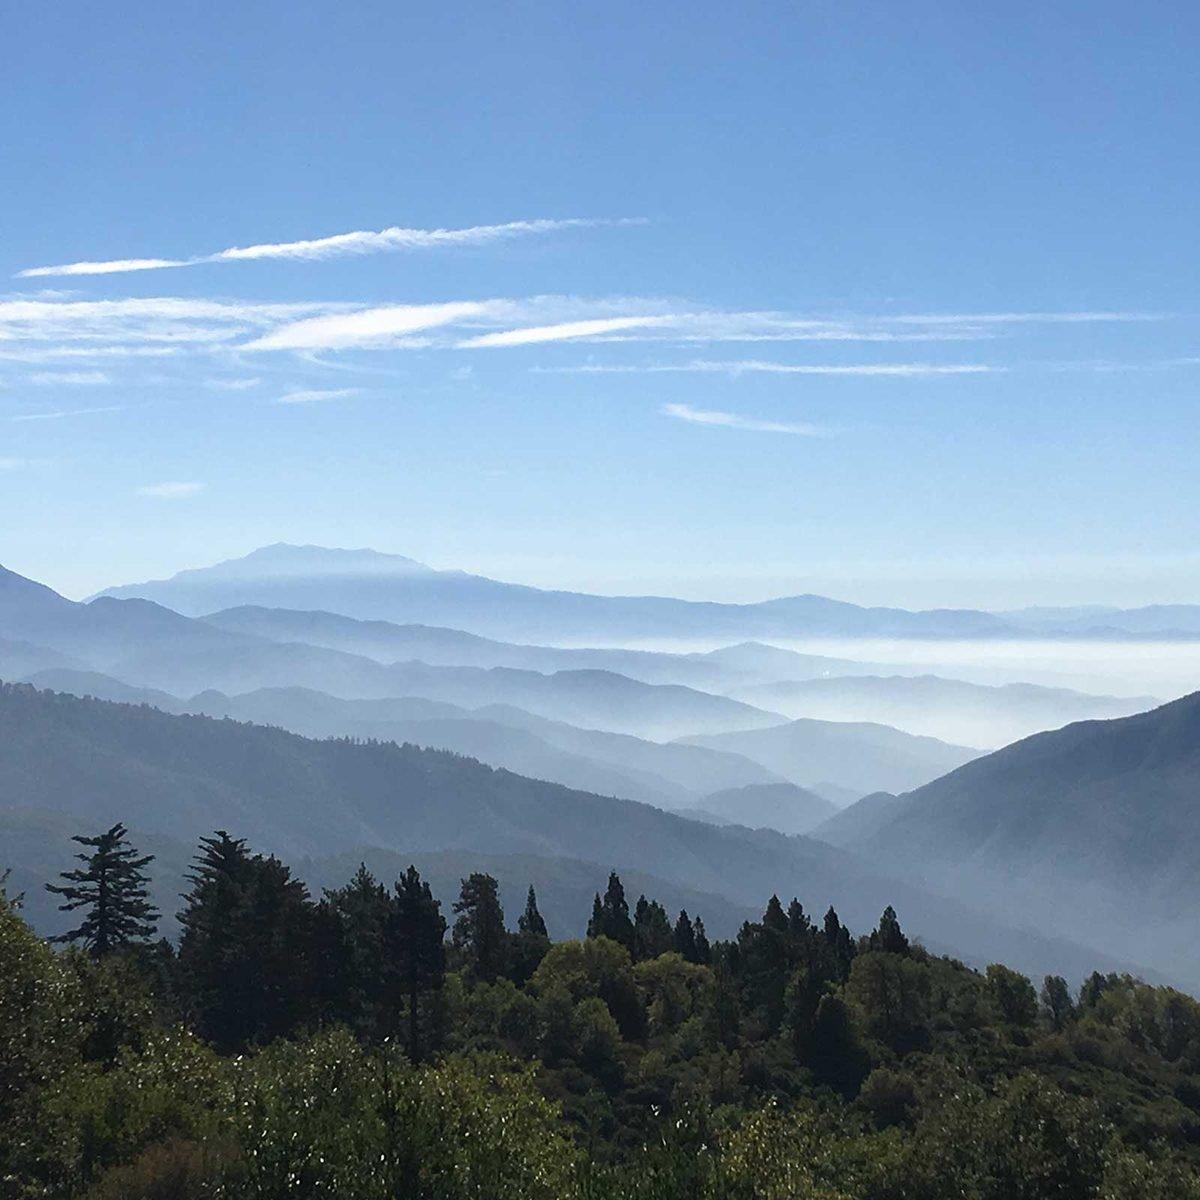 San Bernardino Mountains, California